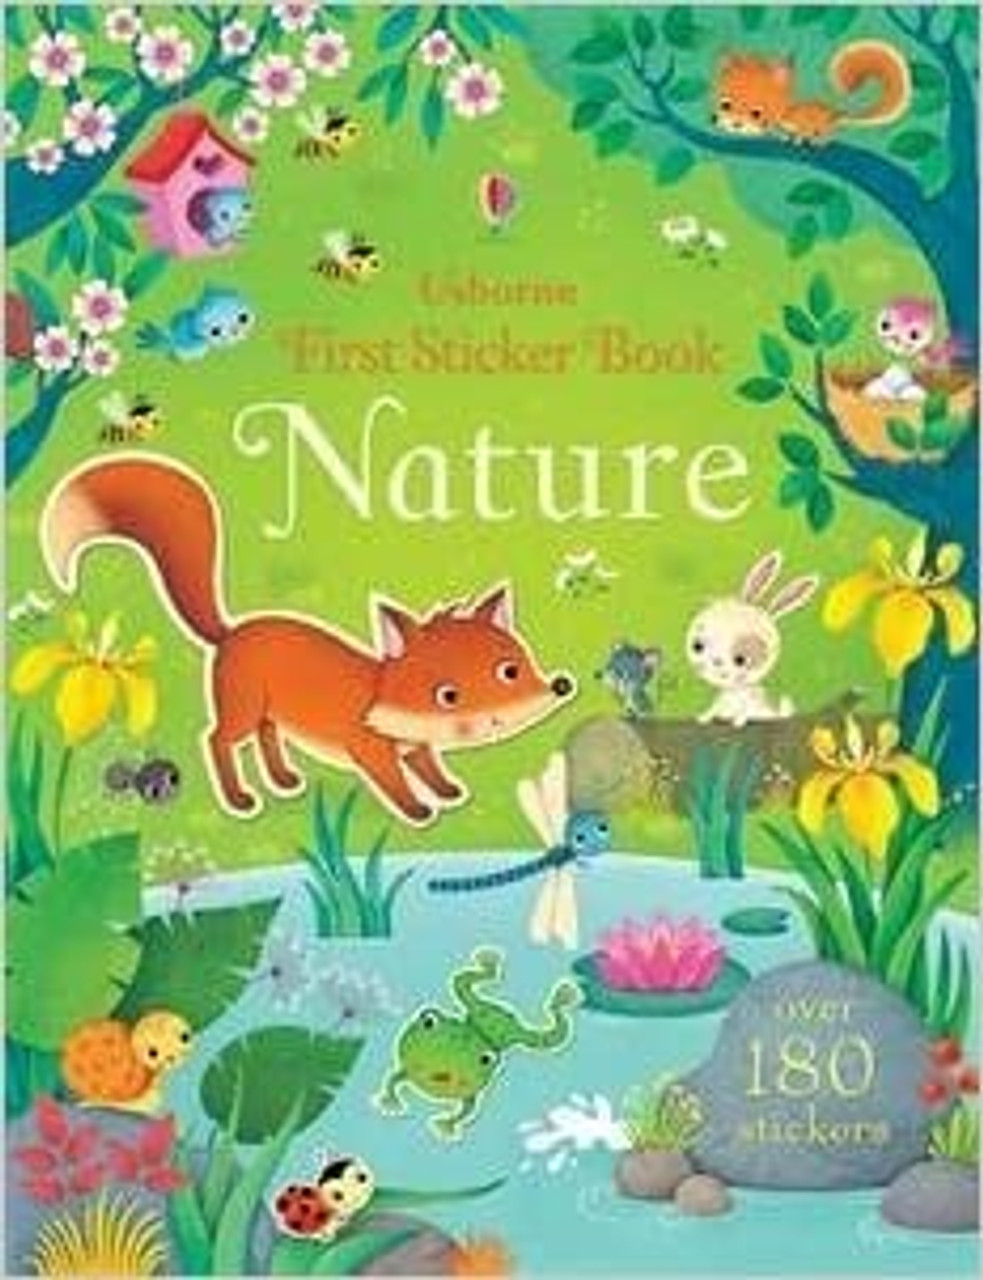 NATURE FIRST STICKER BOOK